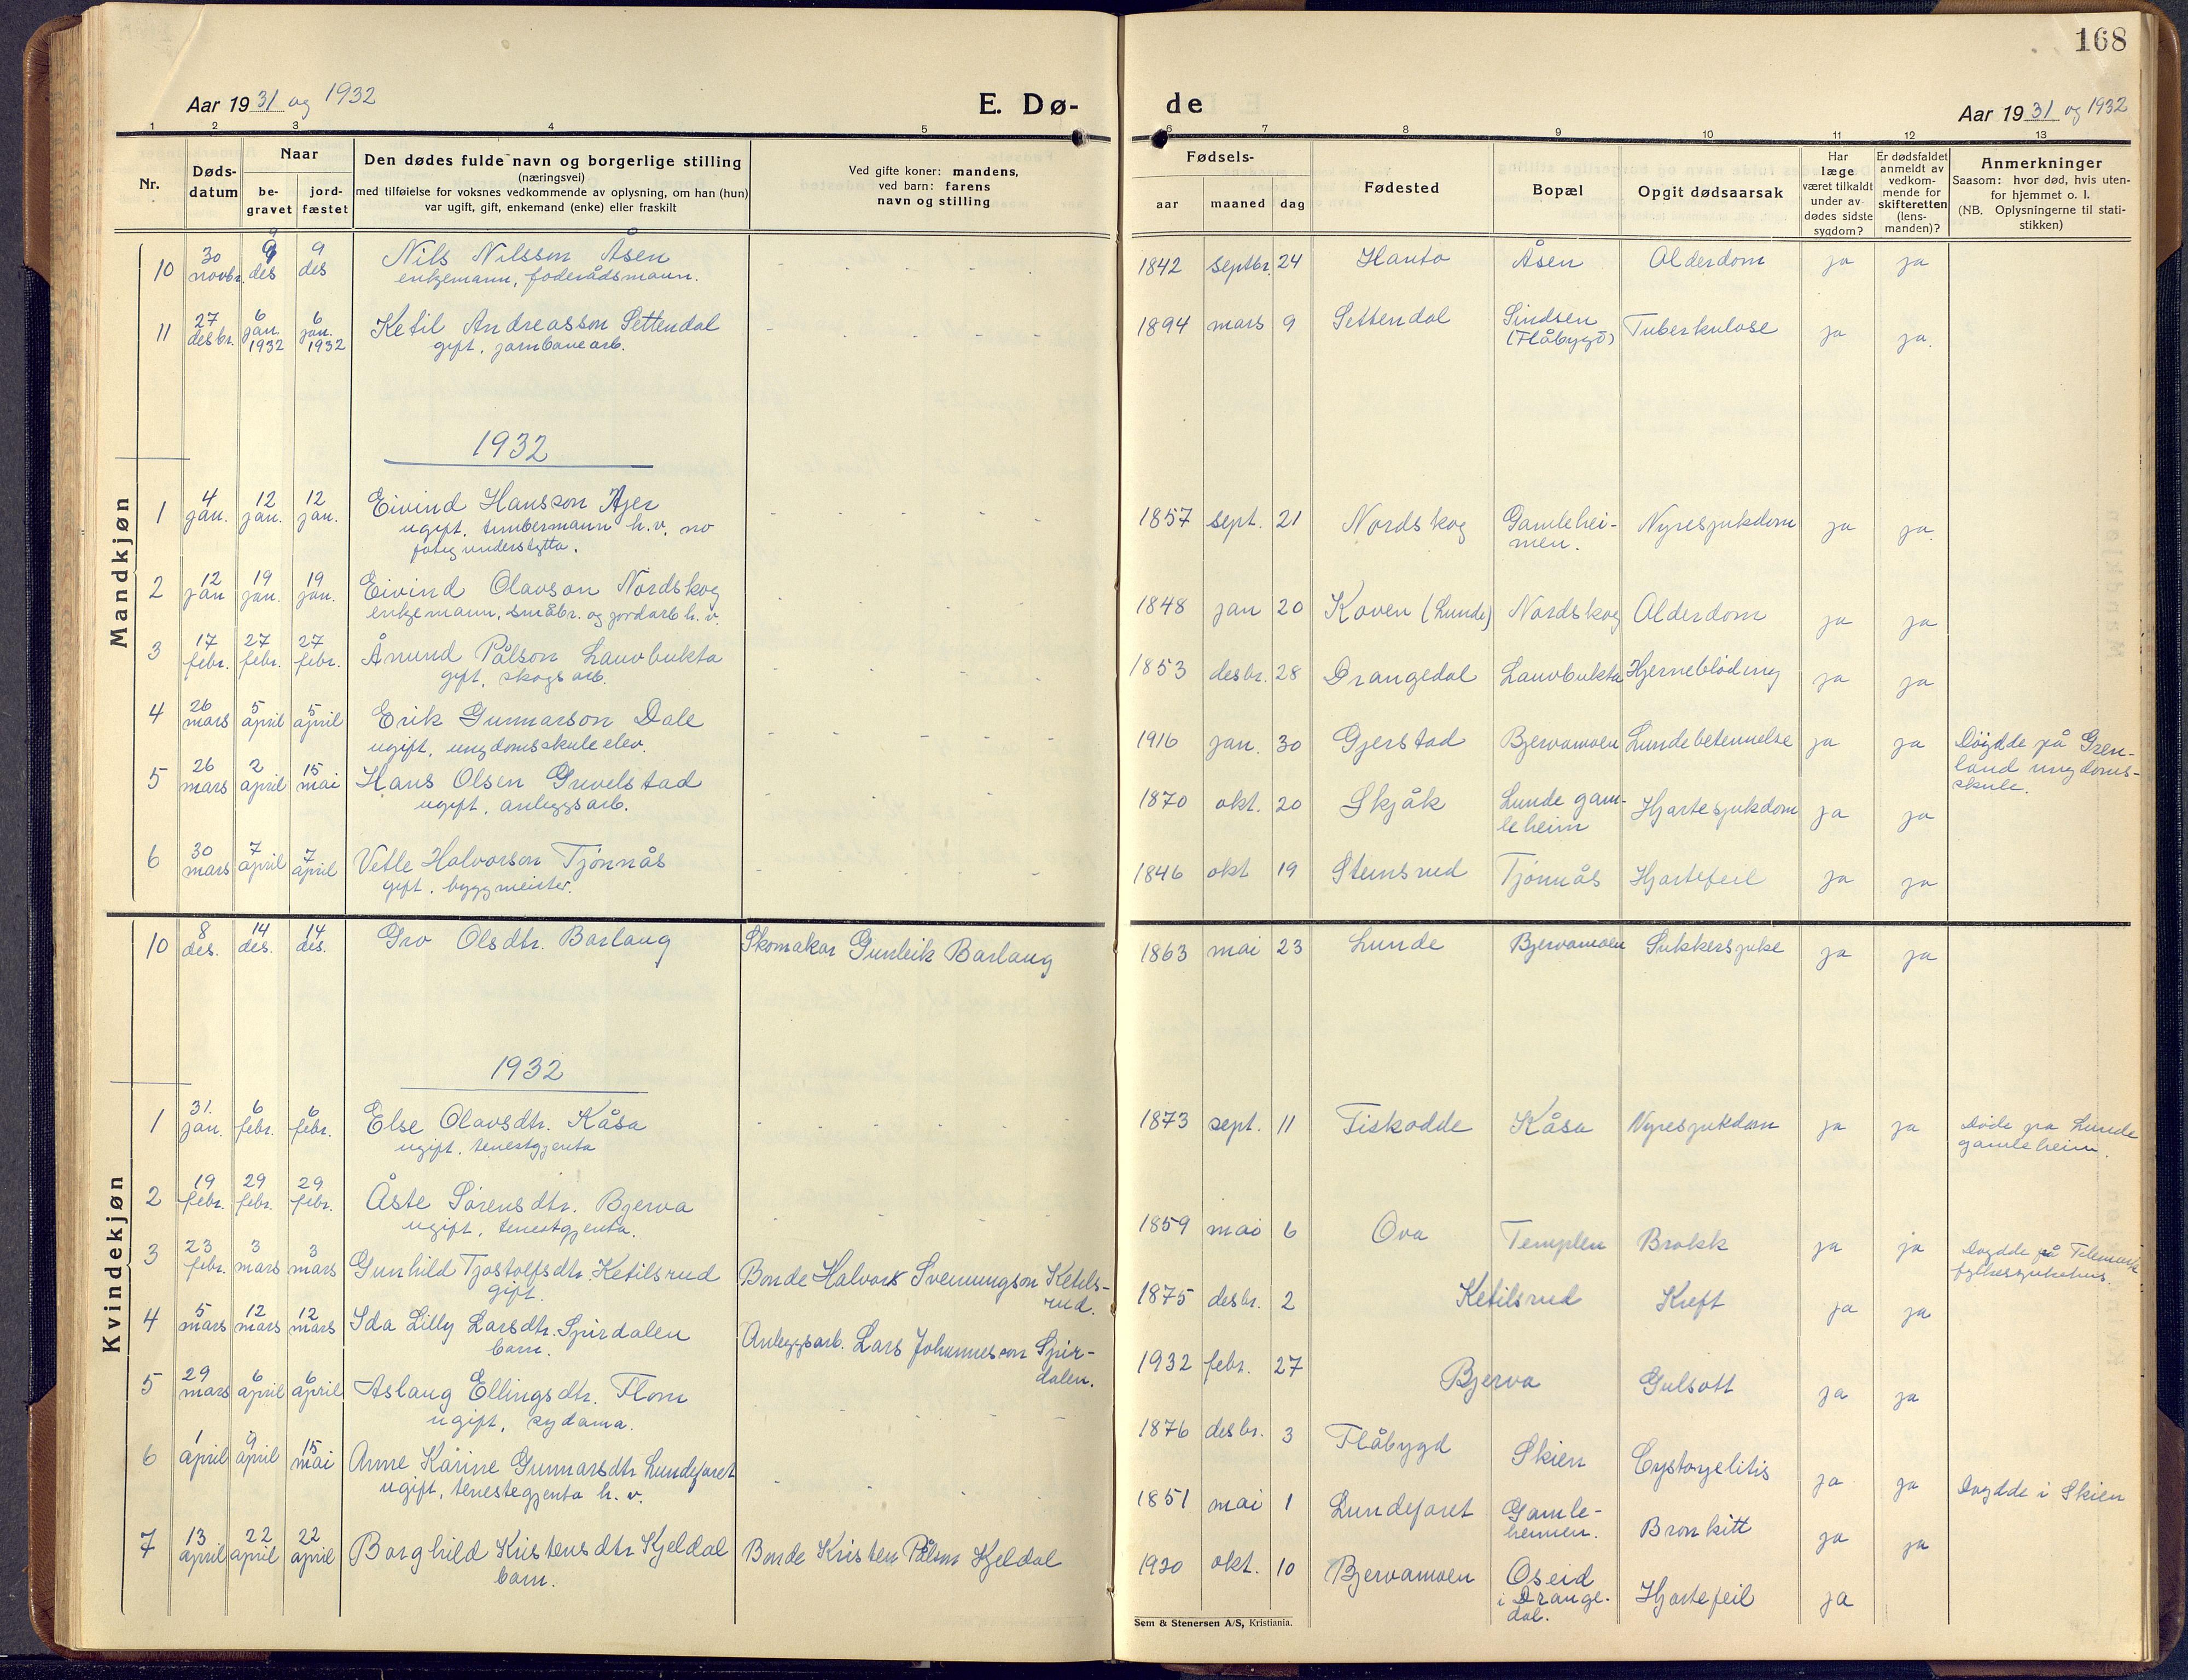 SAKO, Lunde kirkebøker, F/Fa/L0006: Ministerialbok nr. I 6, 1922-1940, s. 168